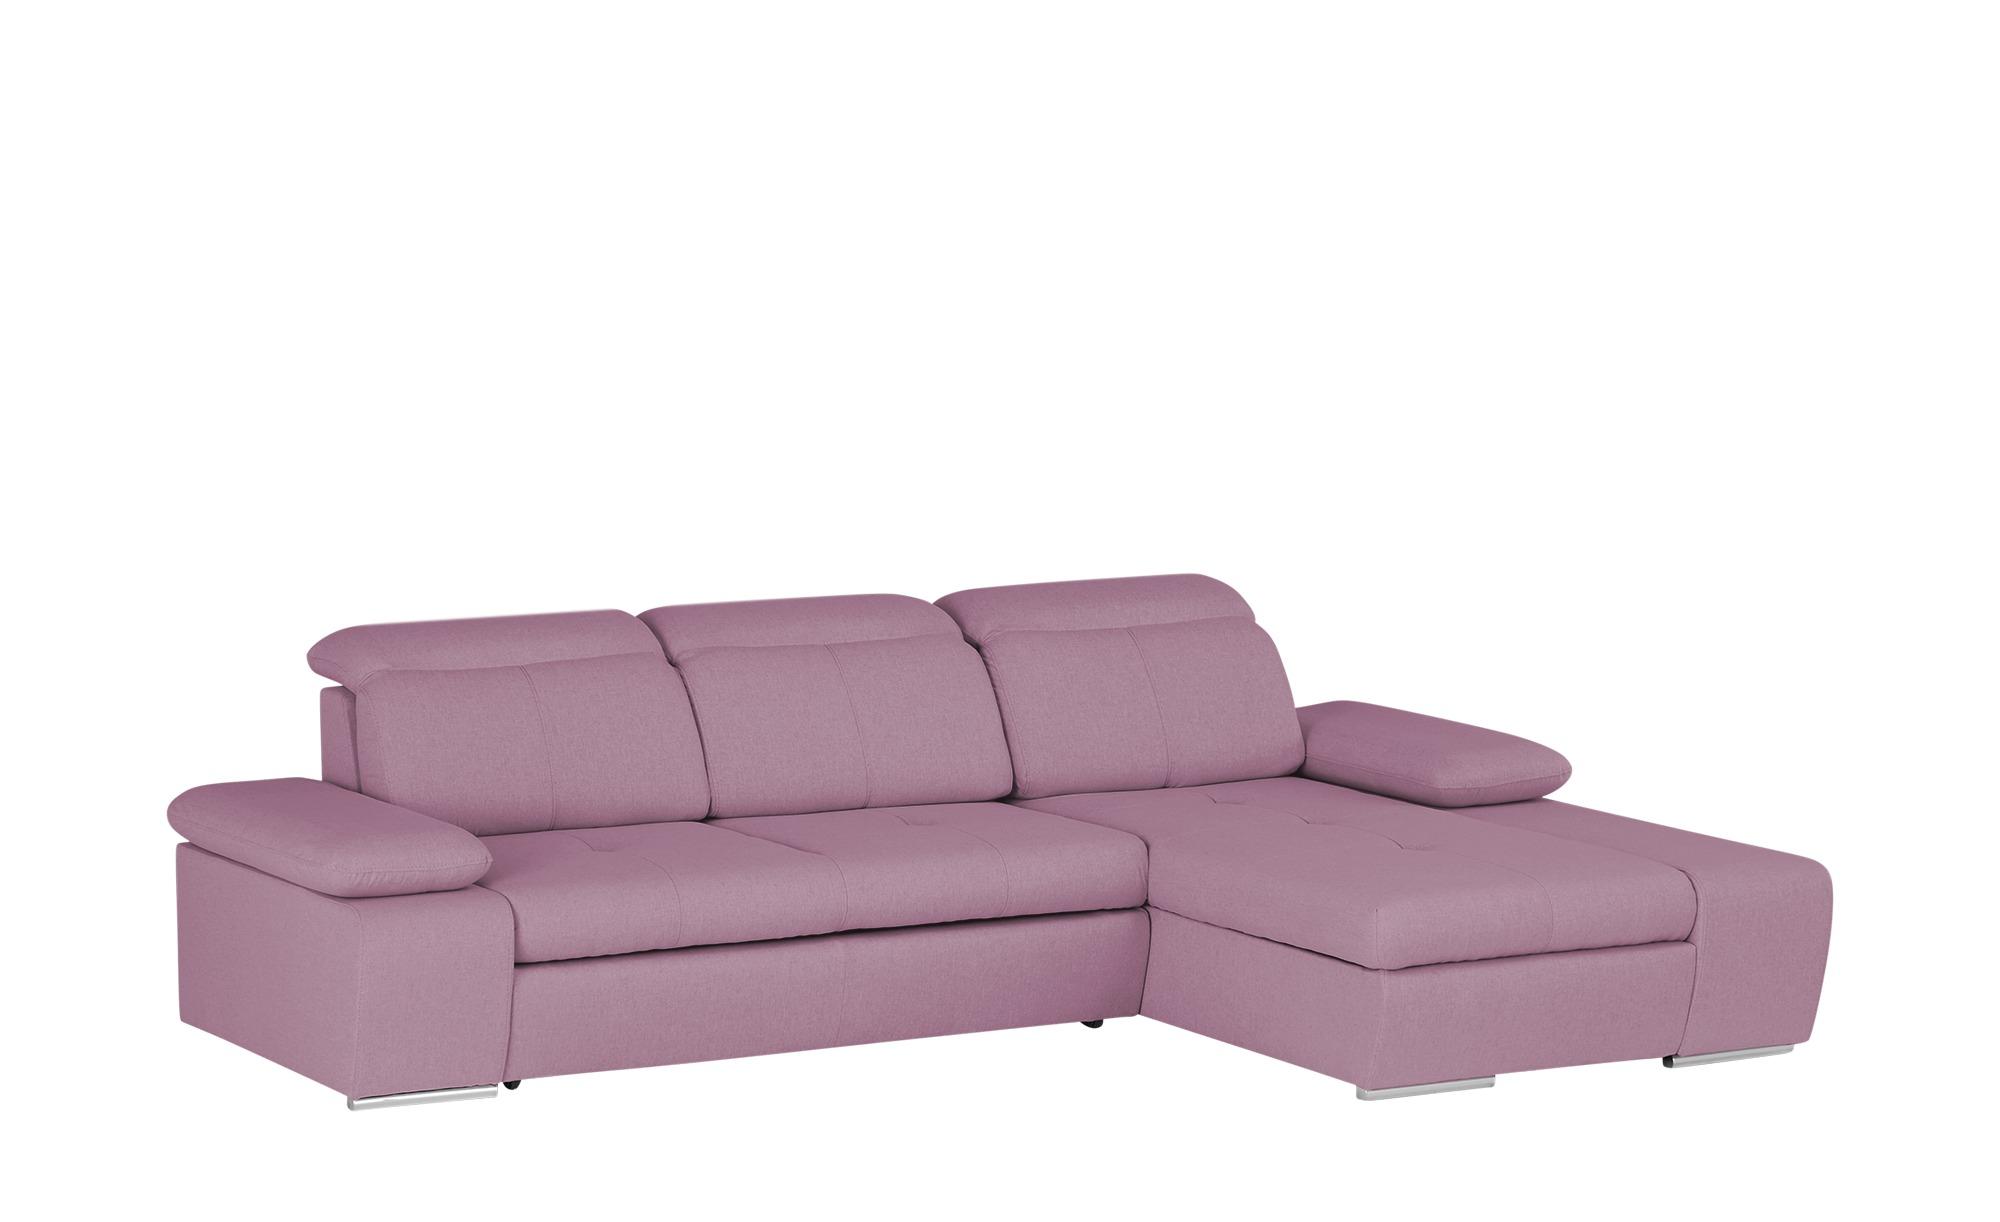 switch Ecksofa  Avilla ¦ rosa/pink ¦ Maße (cm): H: 86 Polstermöbel > Sofas > Ecksofas - Höffner